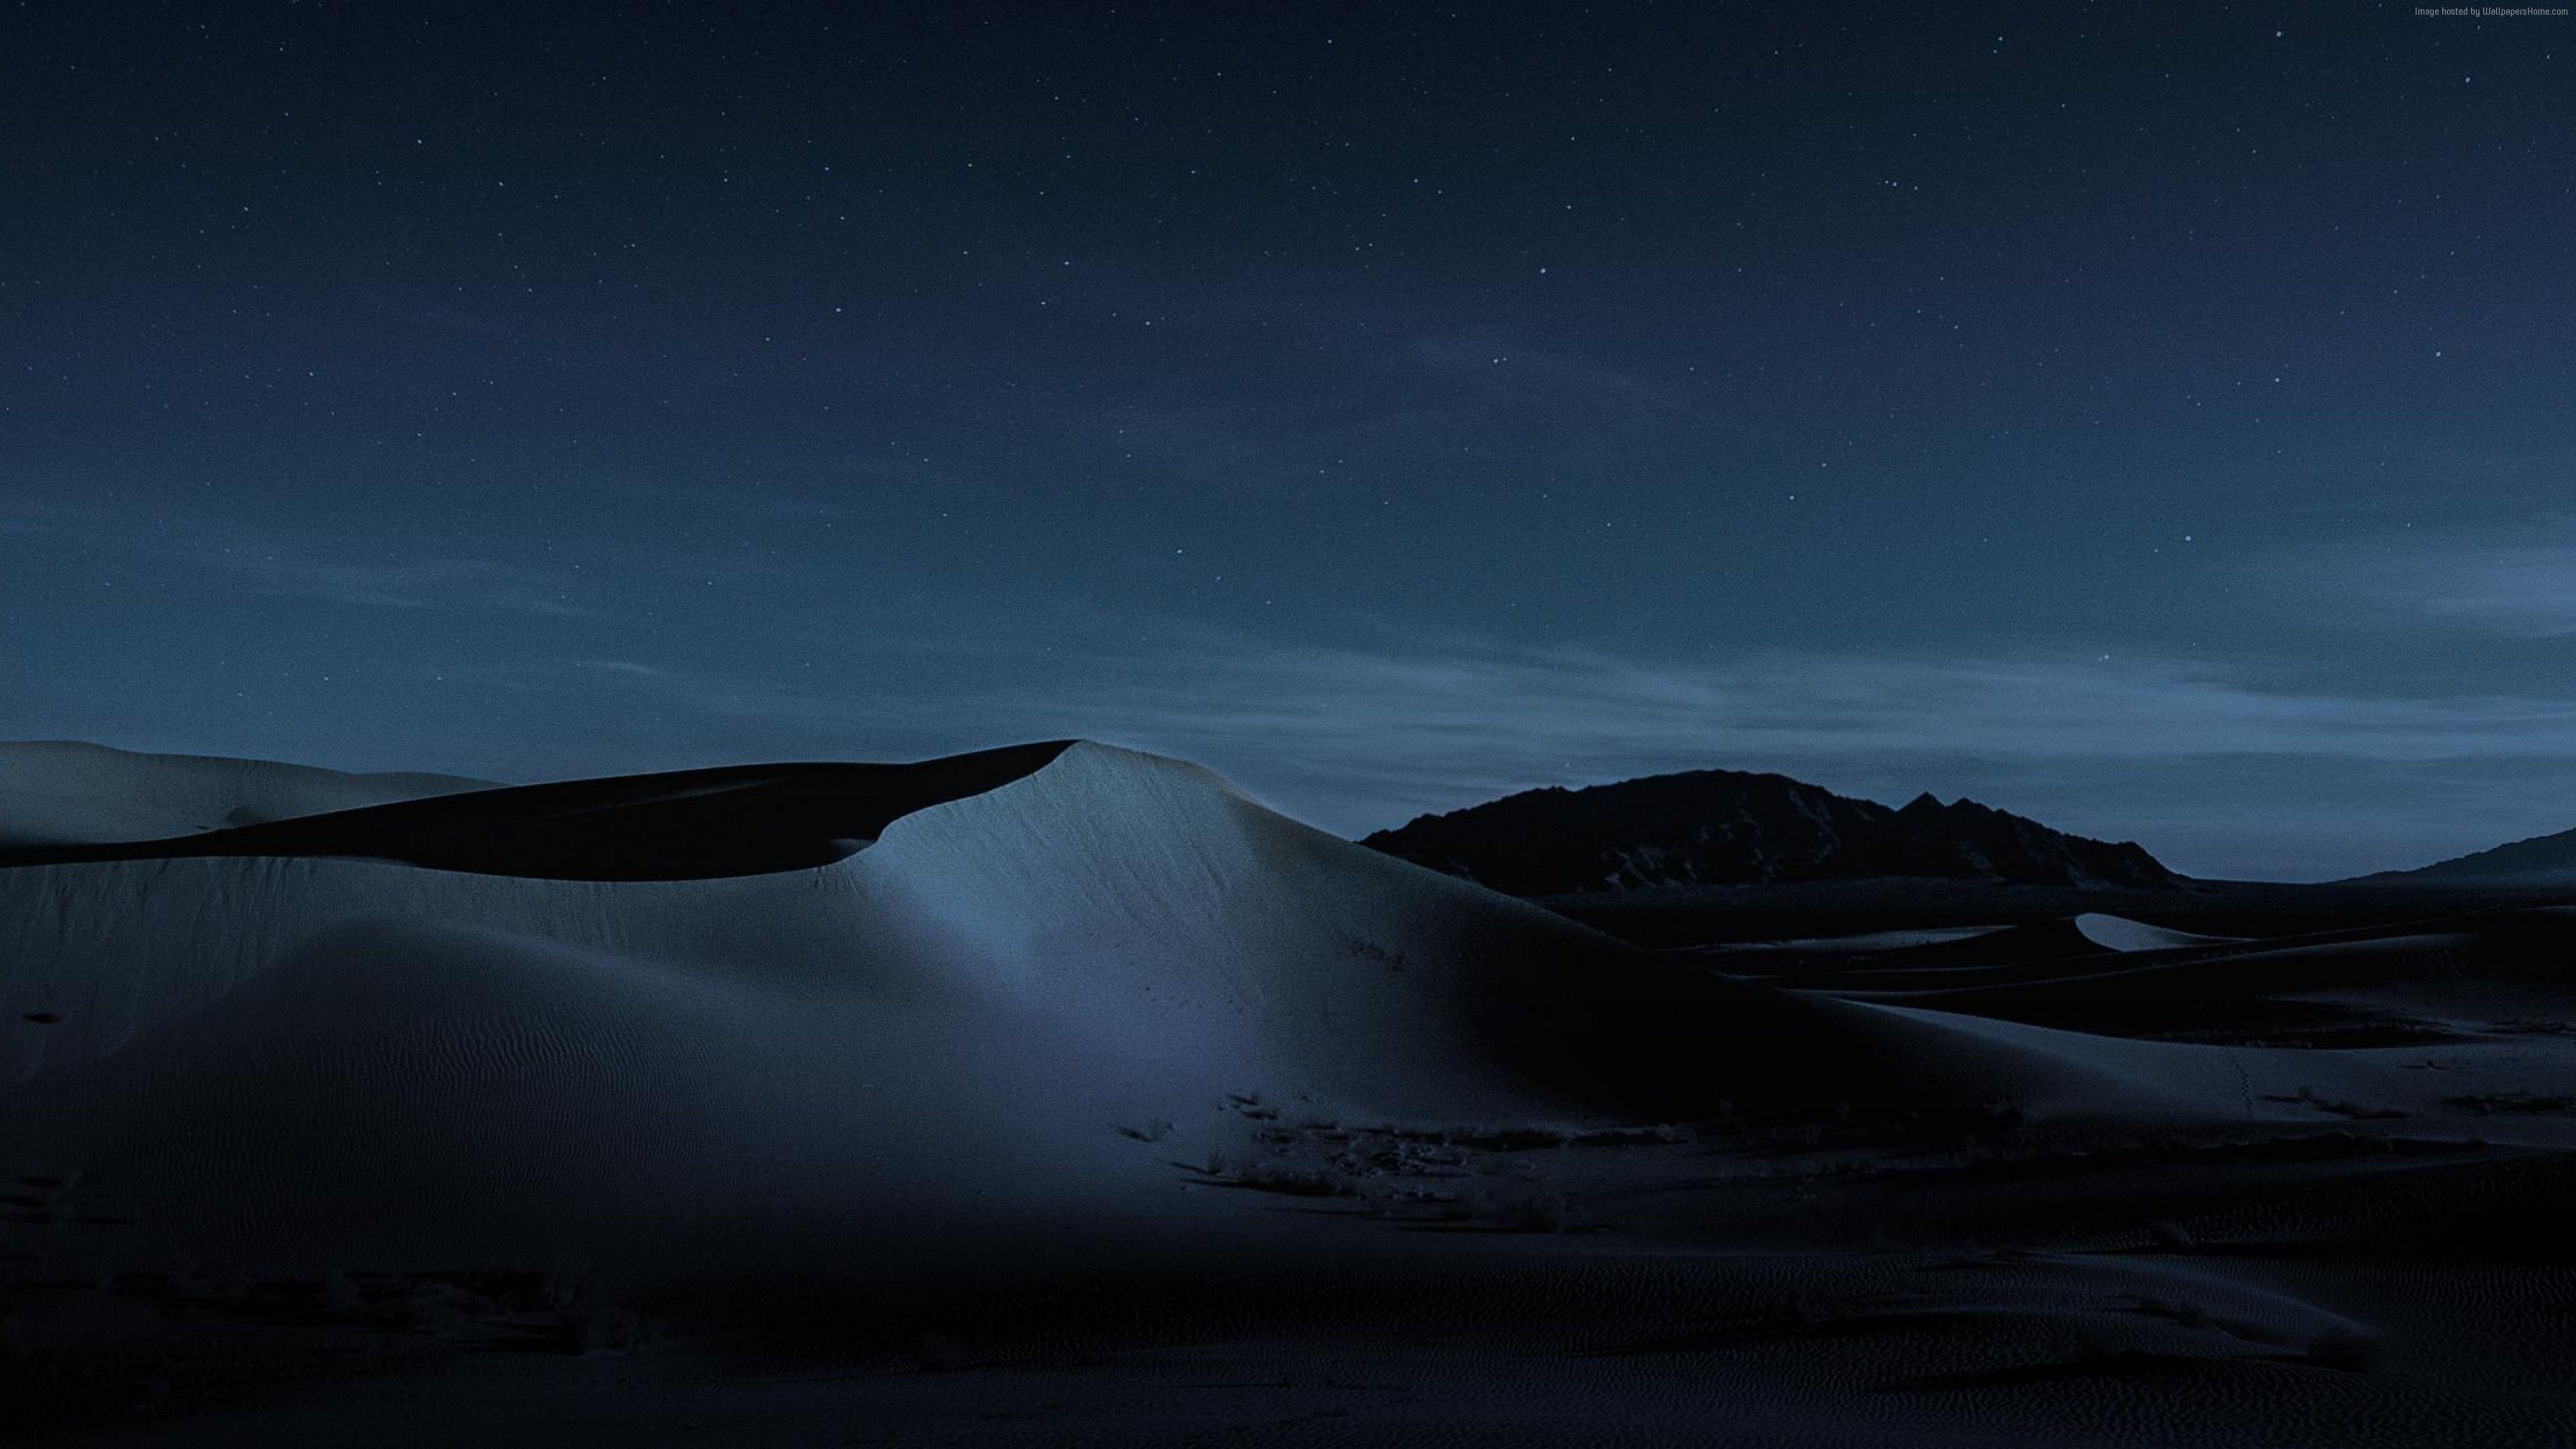 Wallpaper Macos Mojave Night Dunes 4k Os Https Www Pxwall Com Wallpaper Macos Mojave Night Dune Retina Wallpaper Macbook Air Retina Macbook Pro Wallpaper